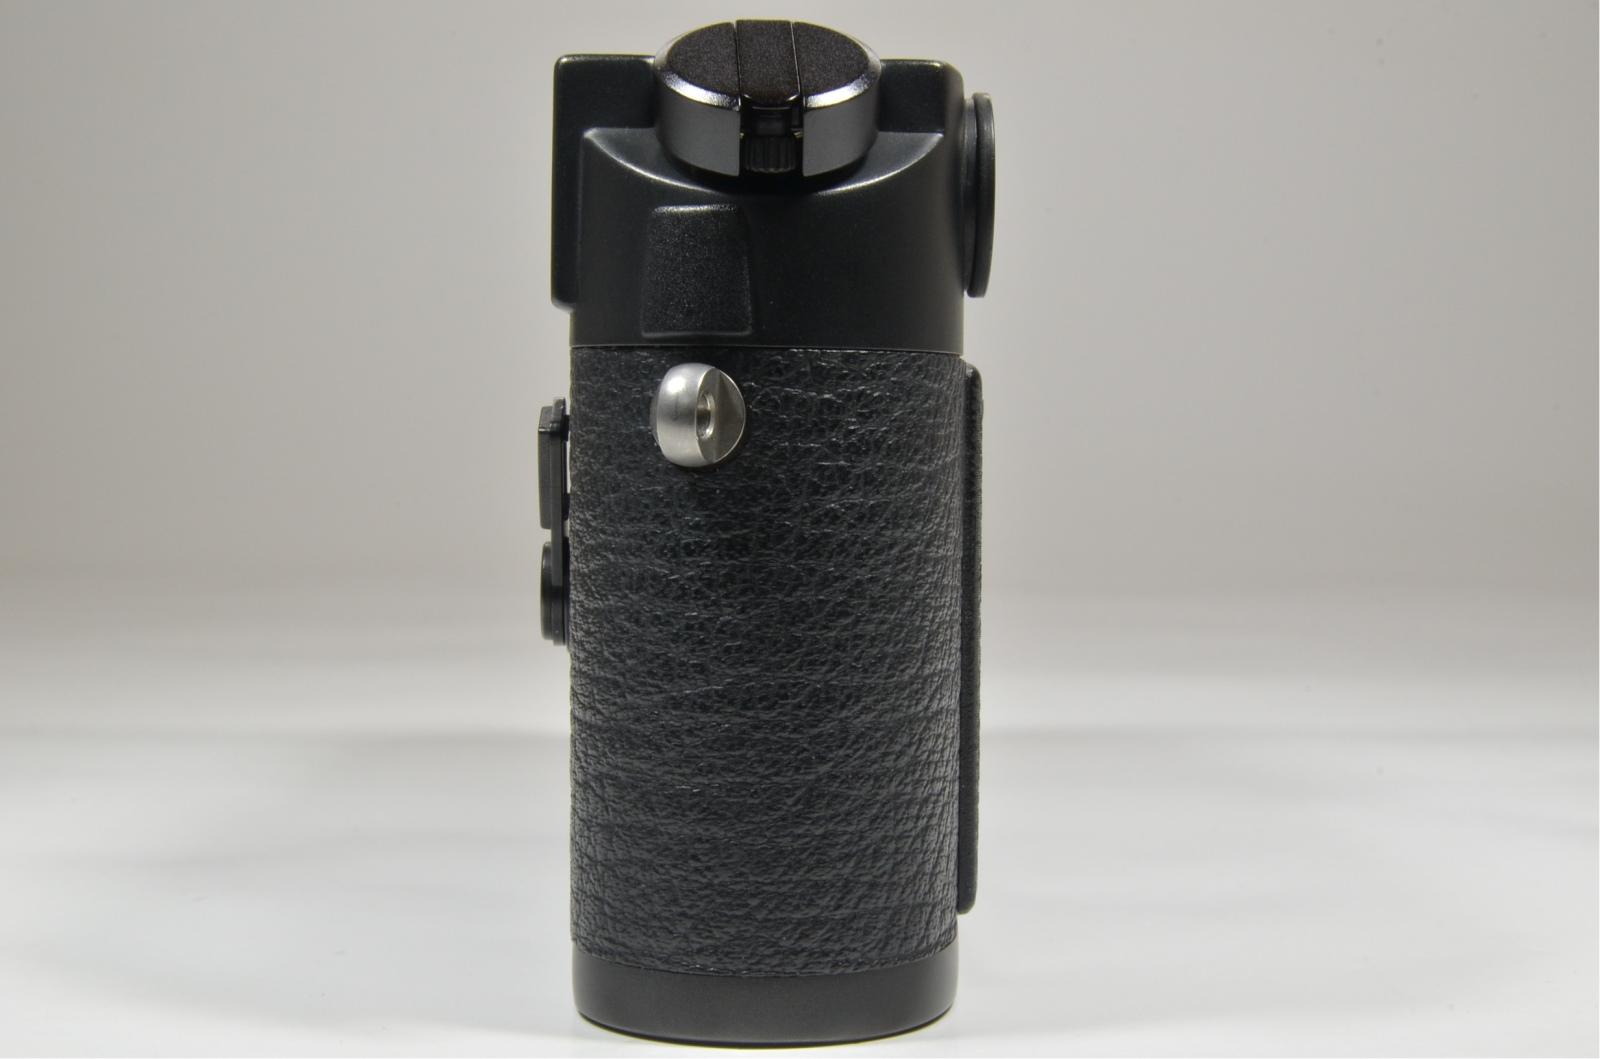 leica m6 0.72 black rangefinder serial no.1688077 year 1986 from japan